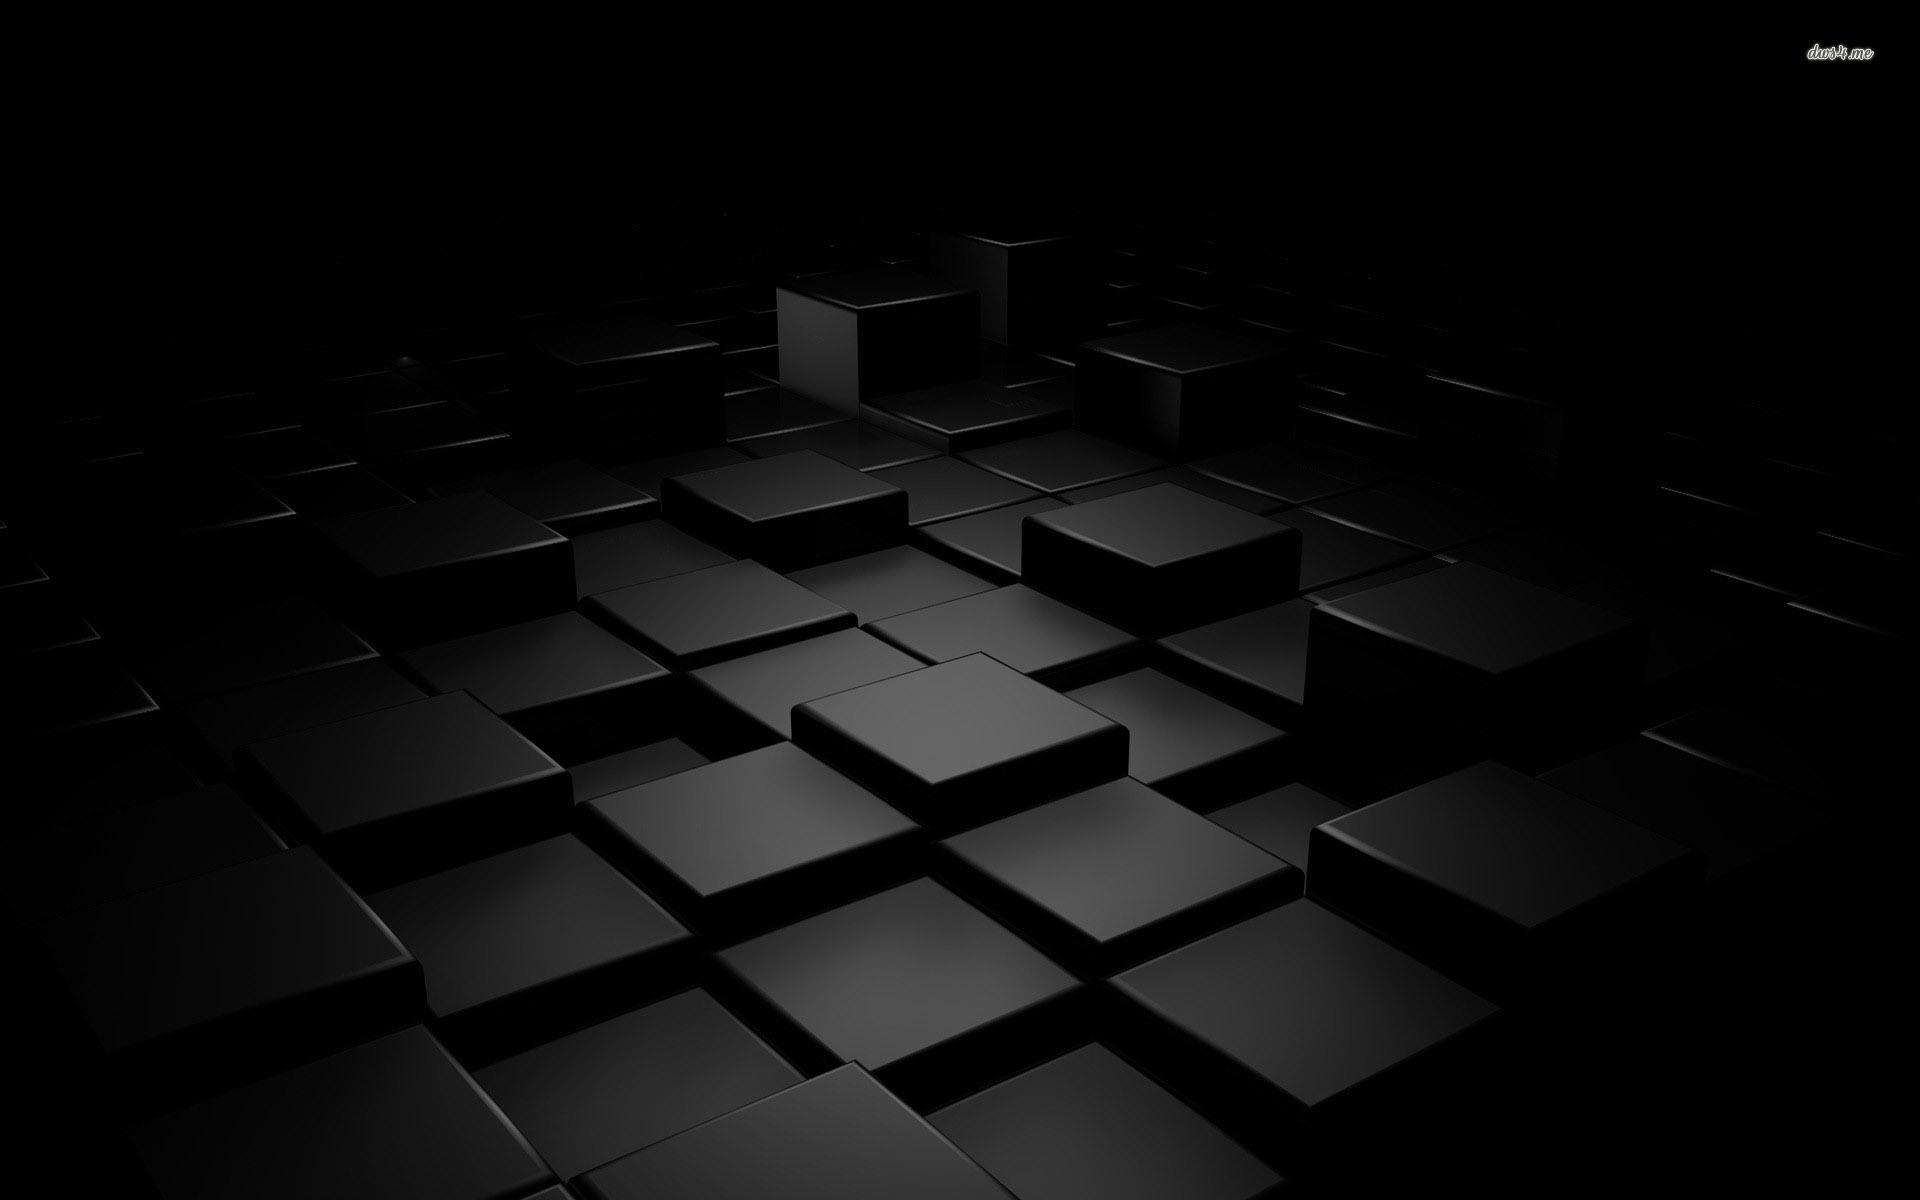 3d black backgrounds wi25 - photo #2